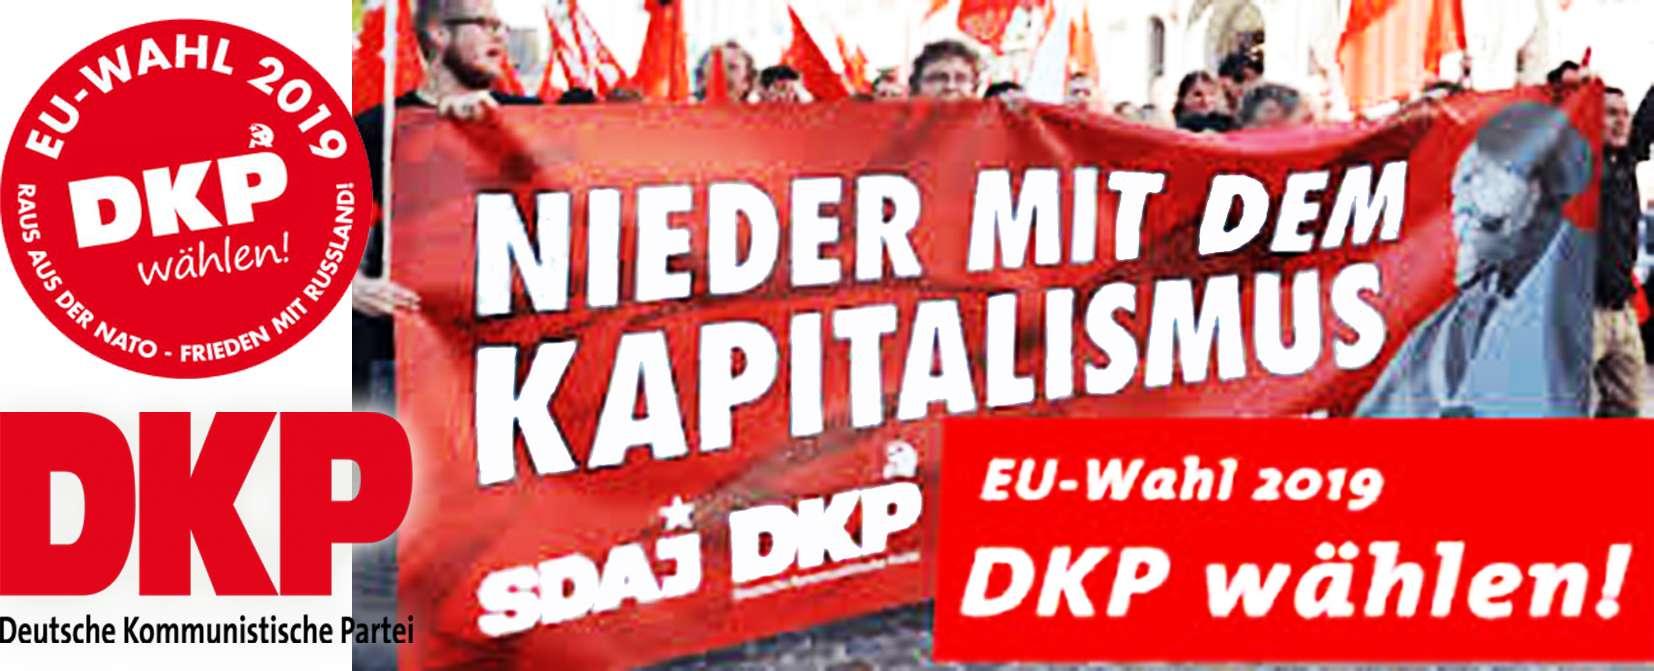 DKP header